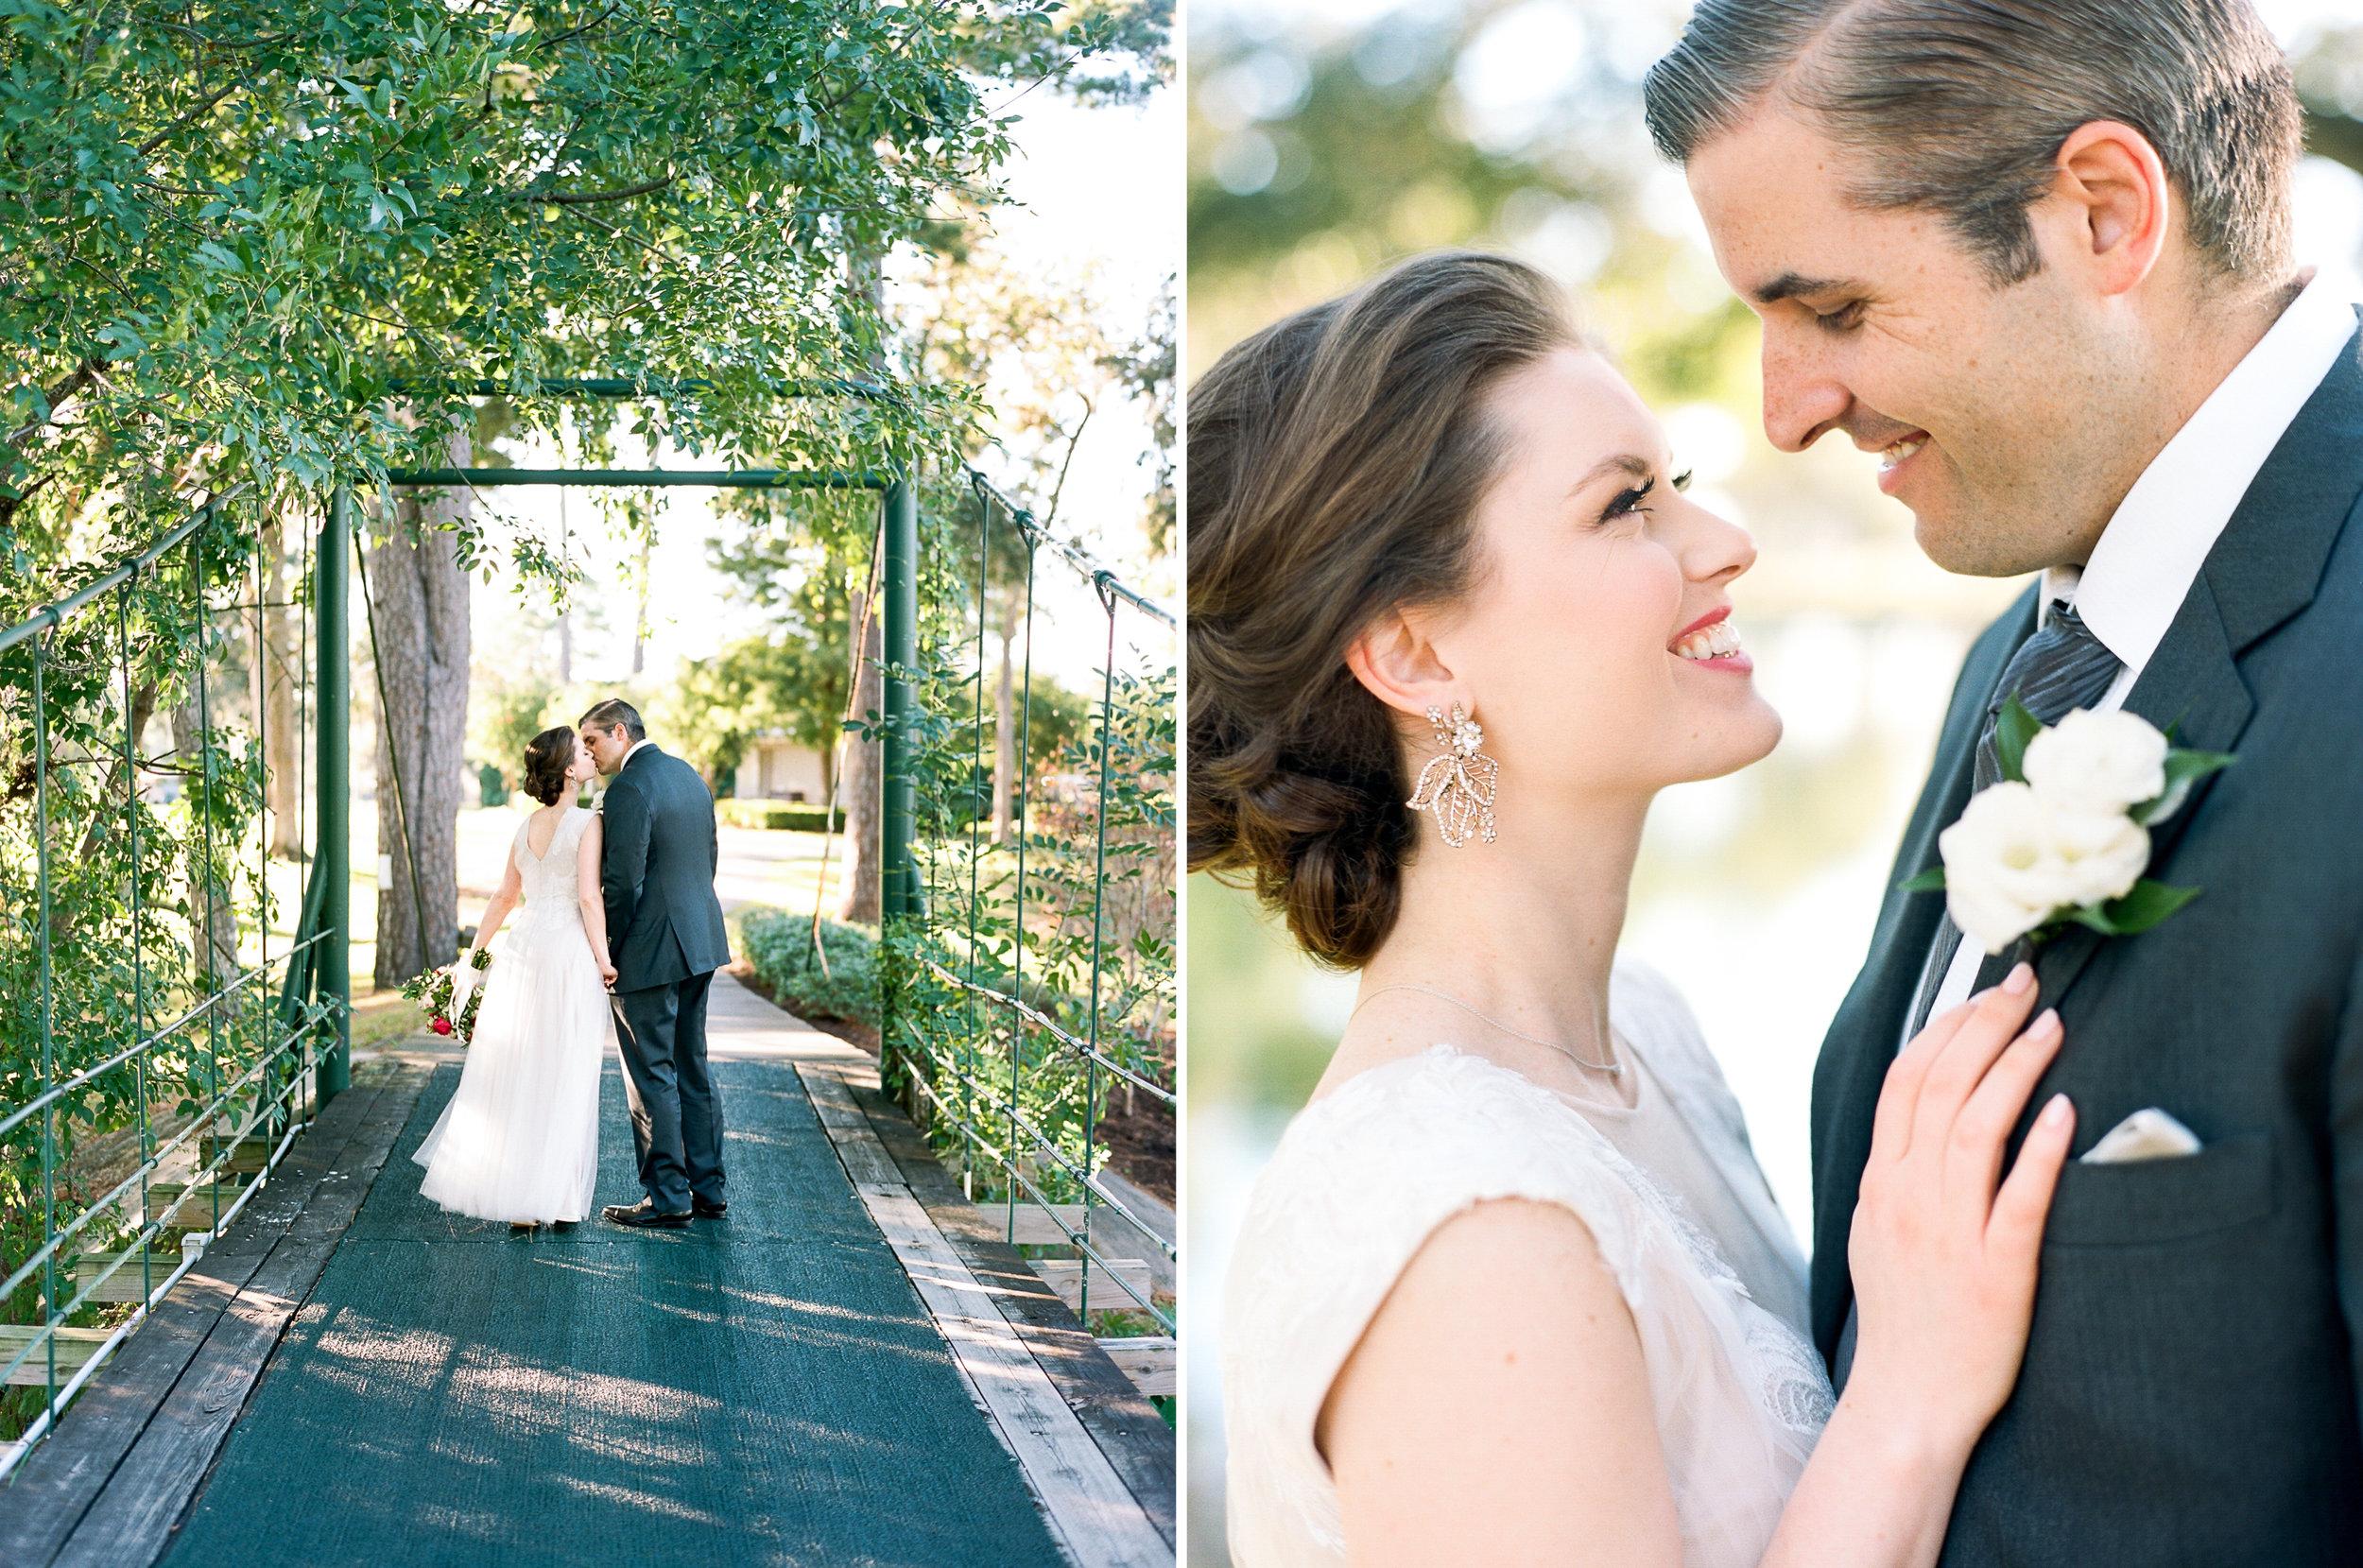 Houston-Wedding-Photographer-Lakeside-Country-Club-First-Look-Bride-Groom-Formals-Film-Fine-Art-Photography-111.jpg